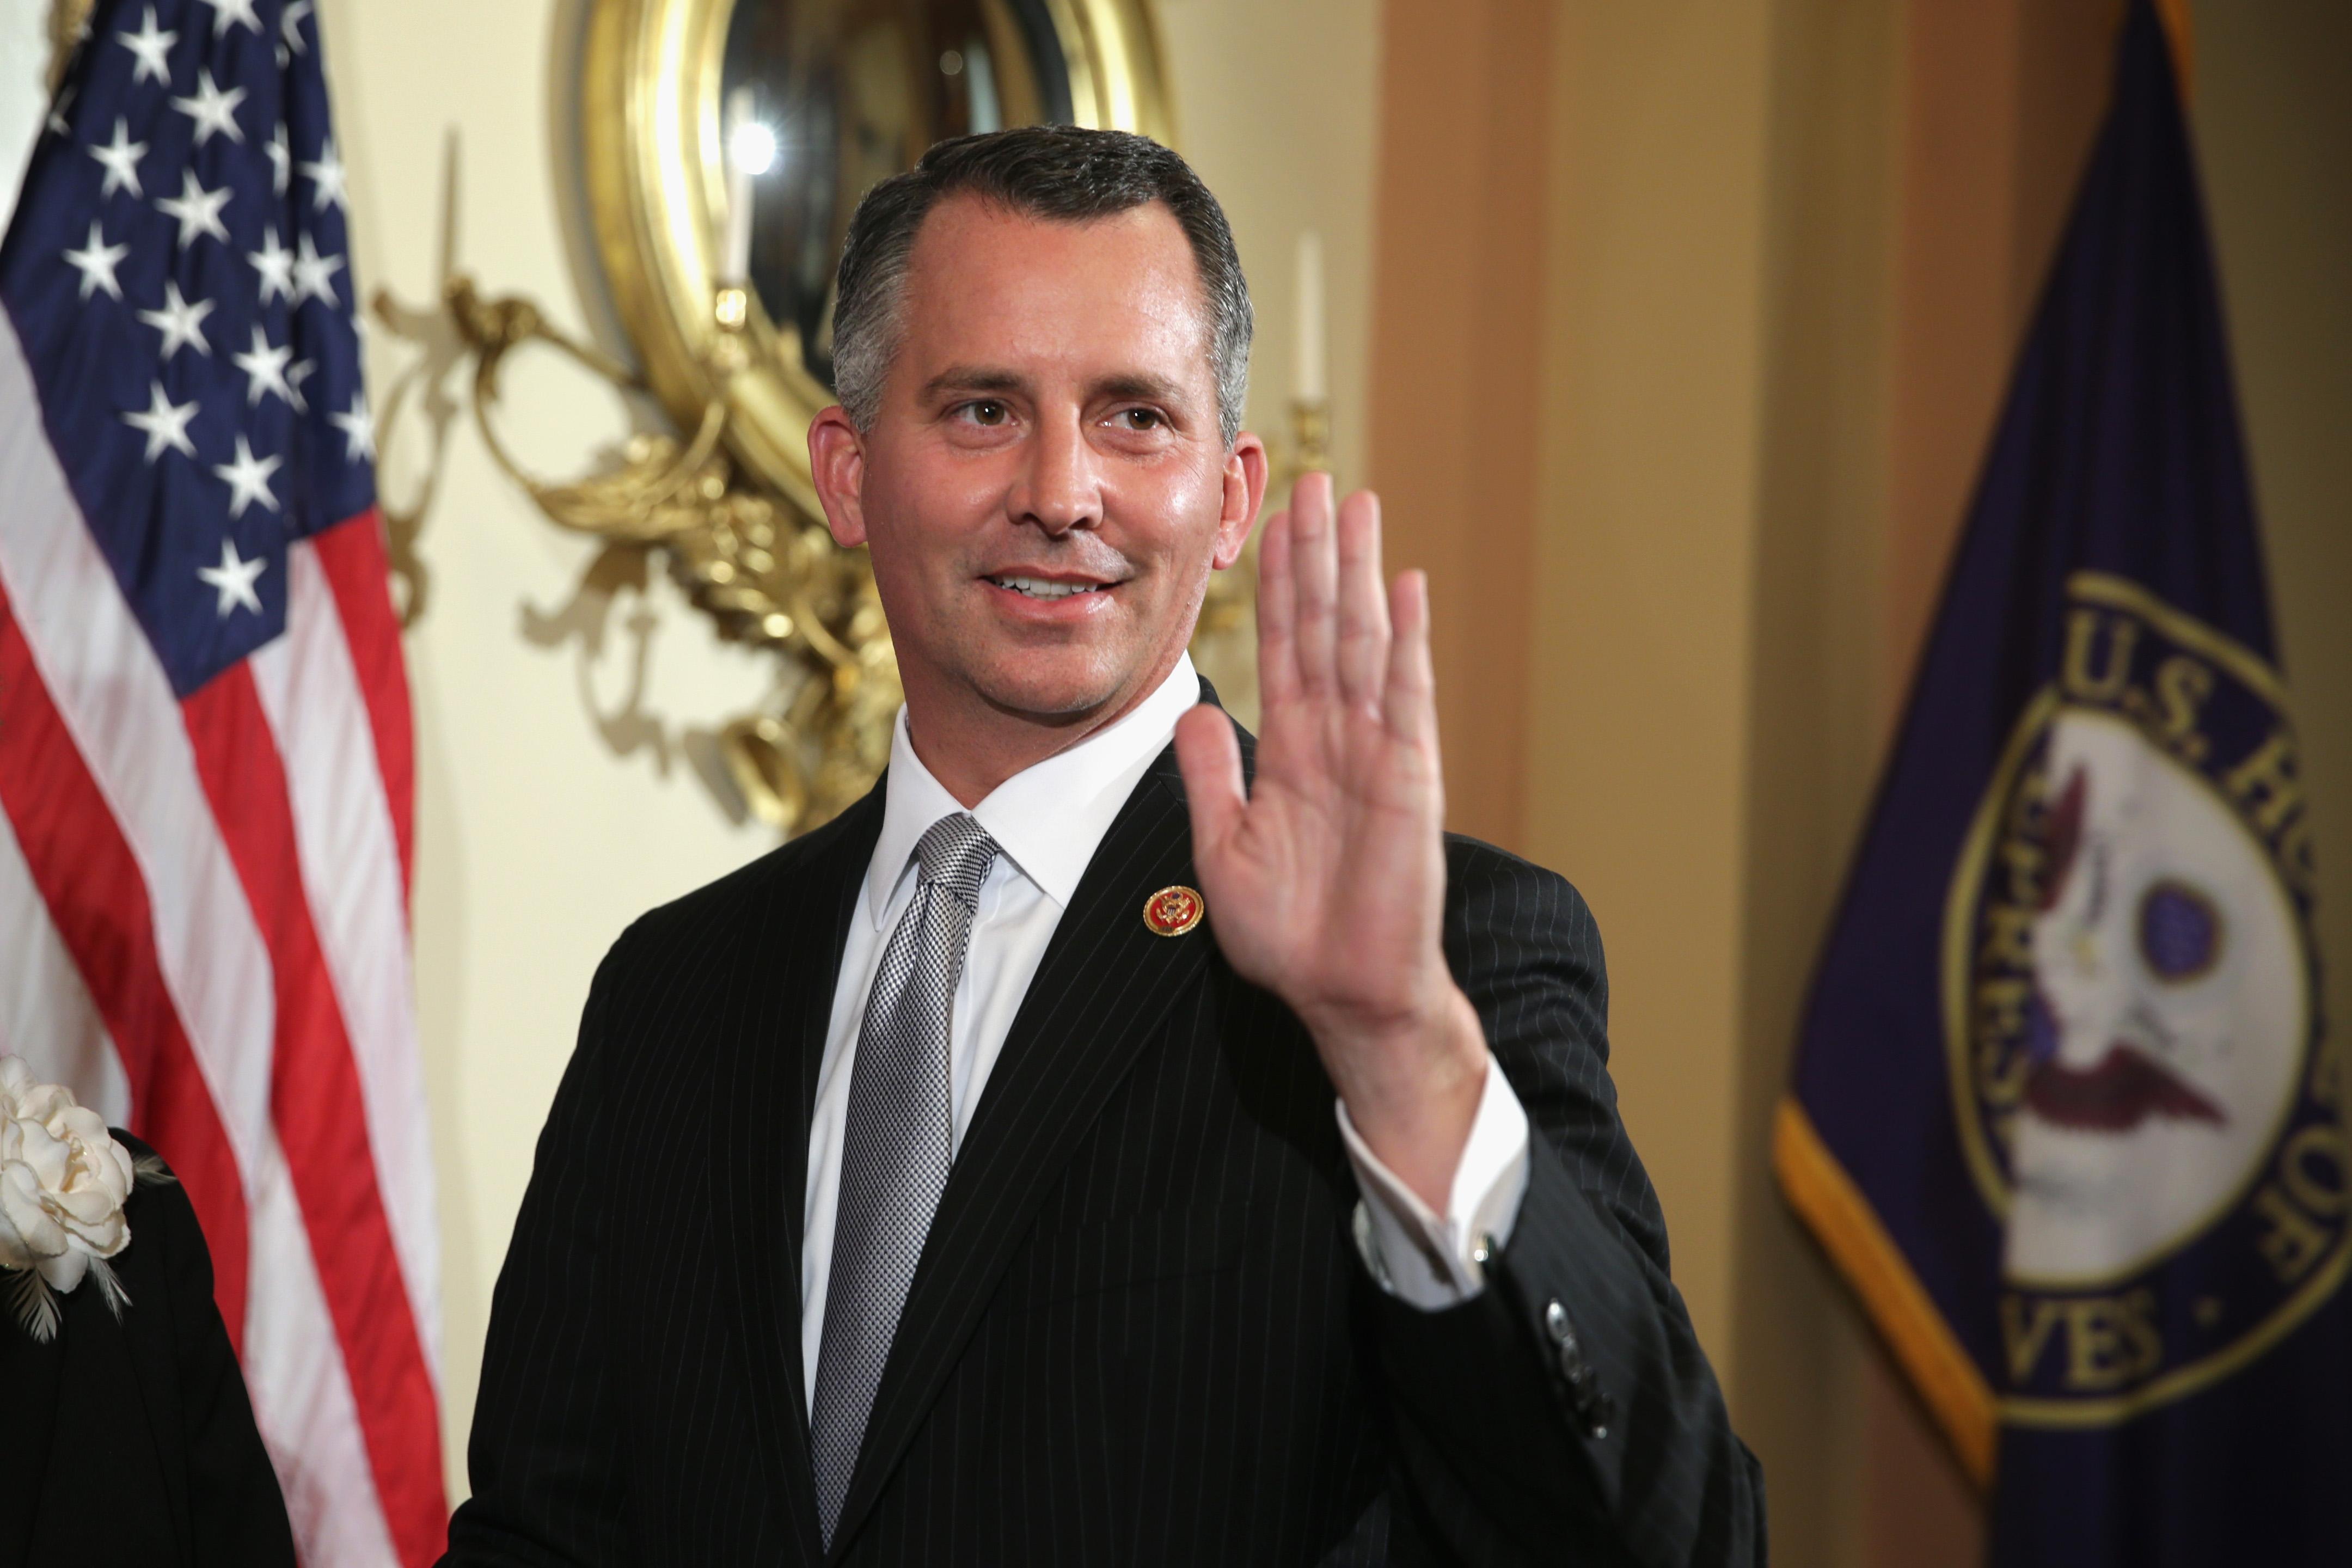 David Jolly, Rep. Jolly, Rep. David Jolly